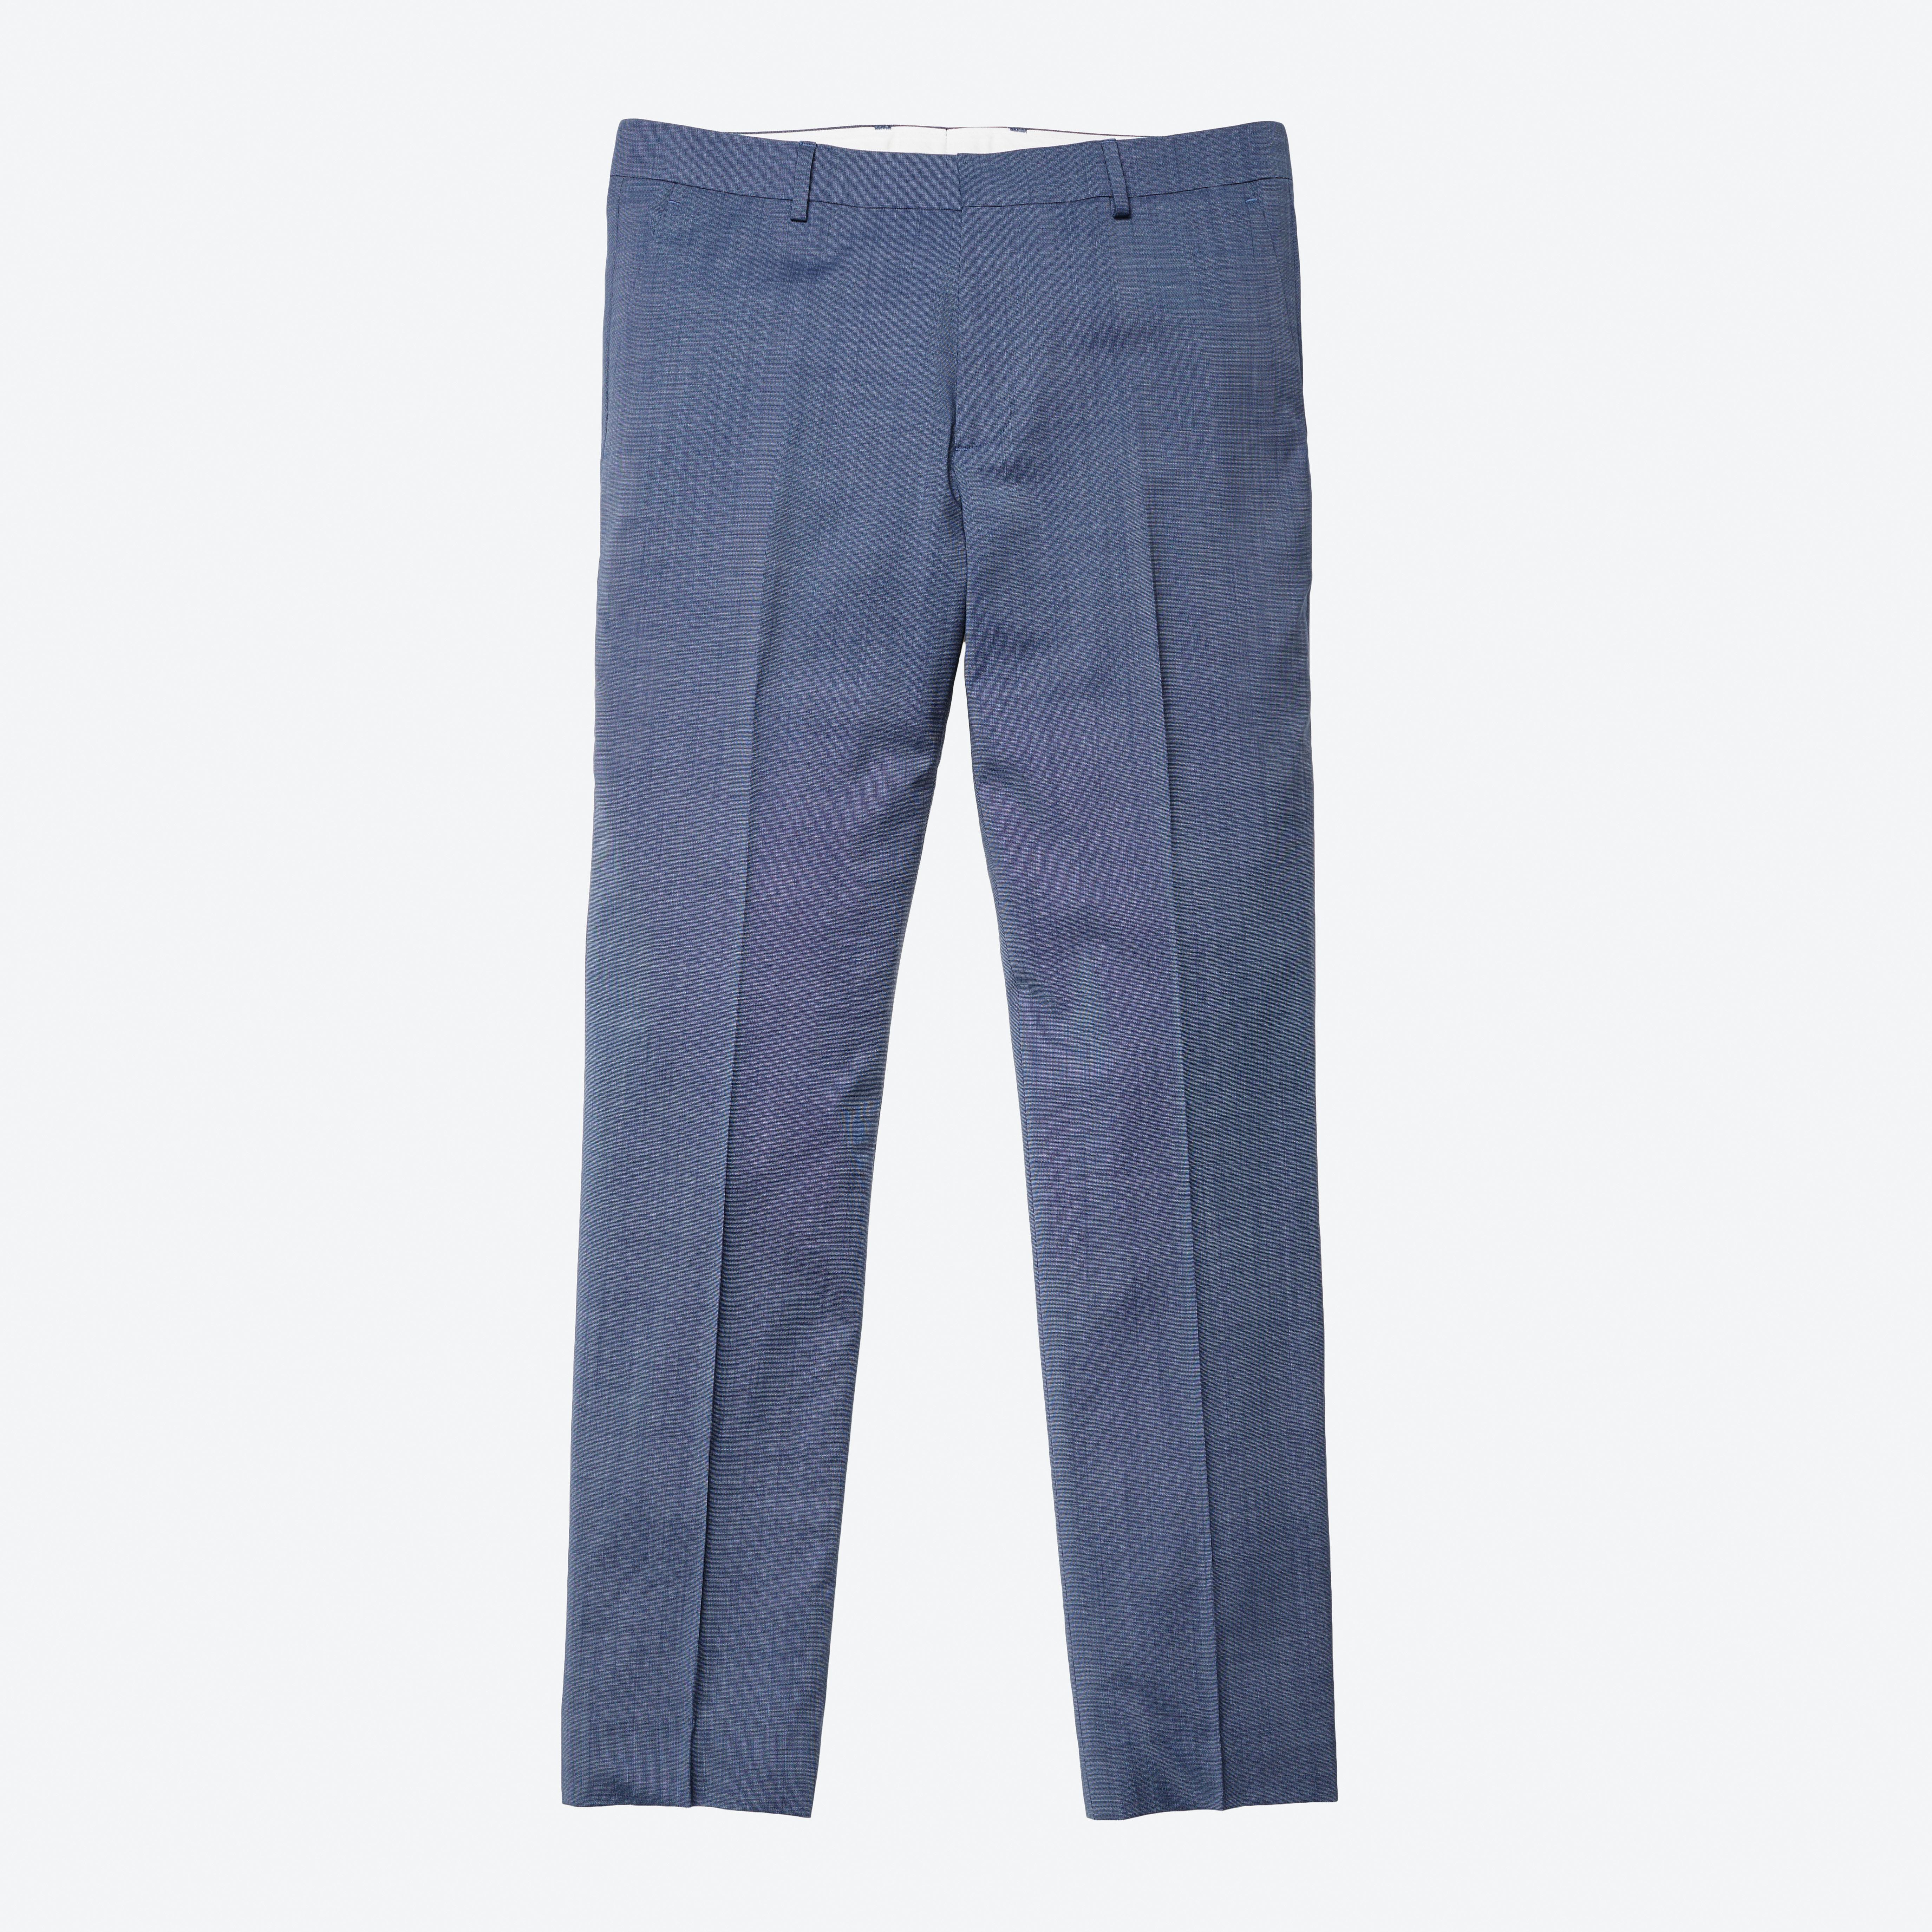 Men's Dress Pants | Bonobos